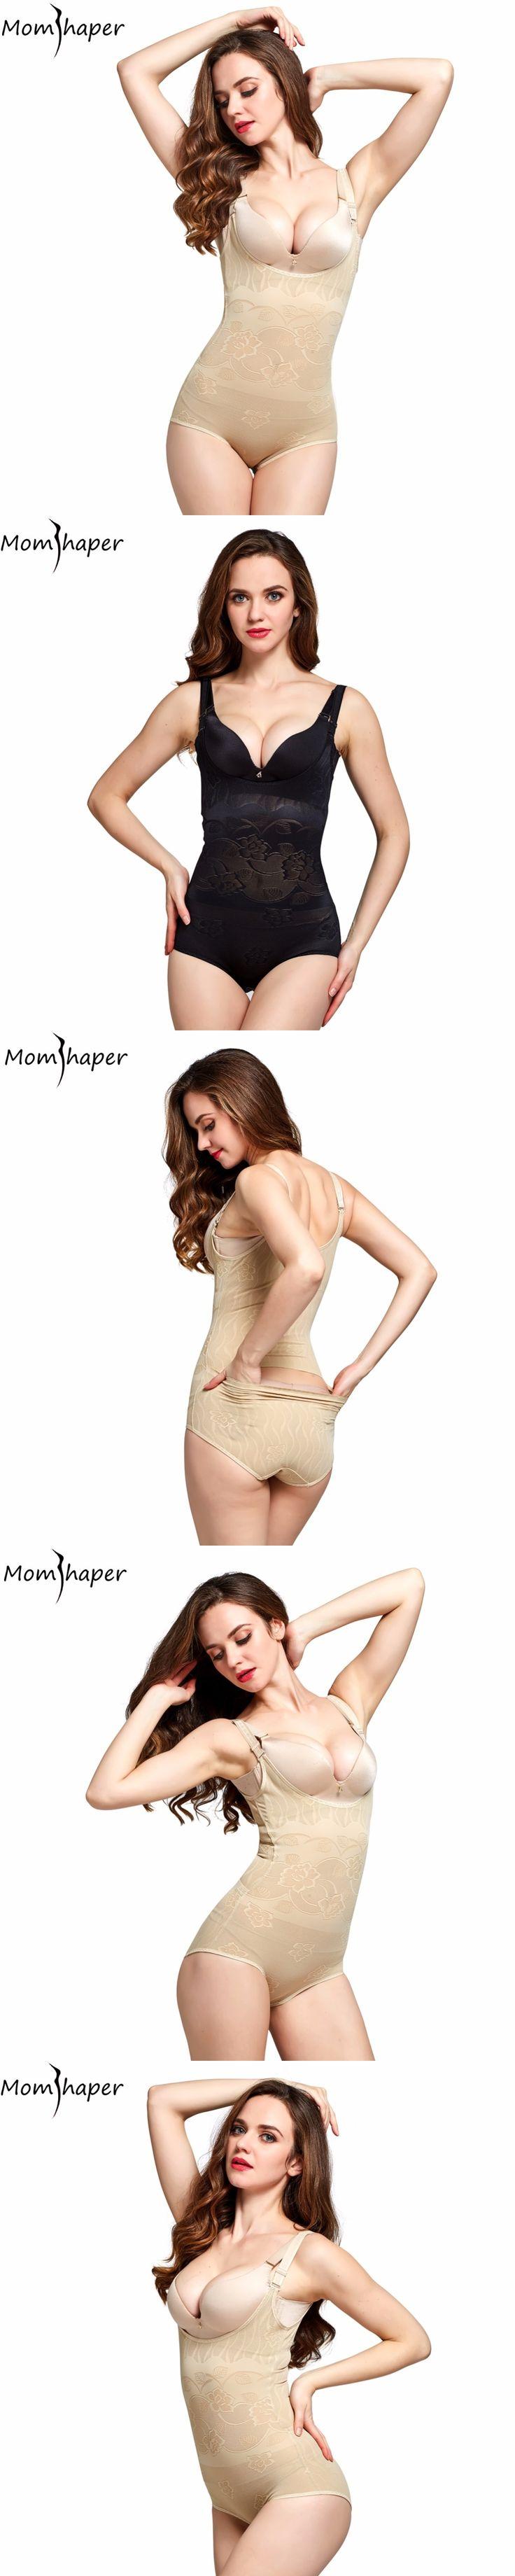 Slimming Underwear bodysuit women waist trainer Slimming Belt body shaper Slimming corset shapewear Maternity  Control pants